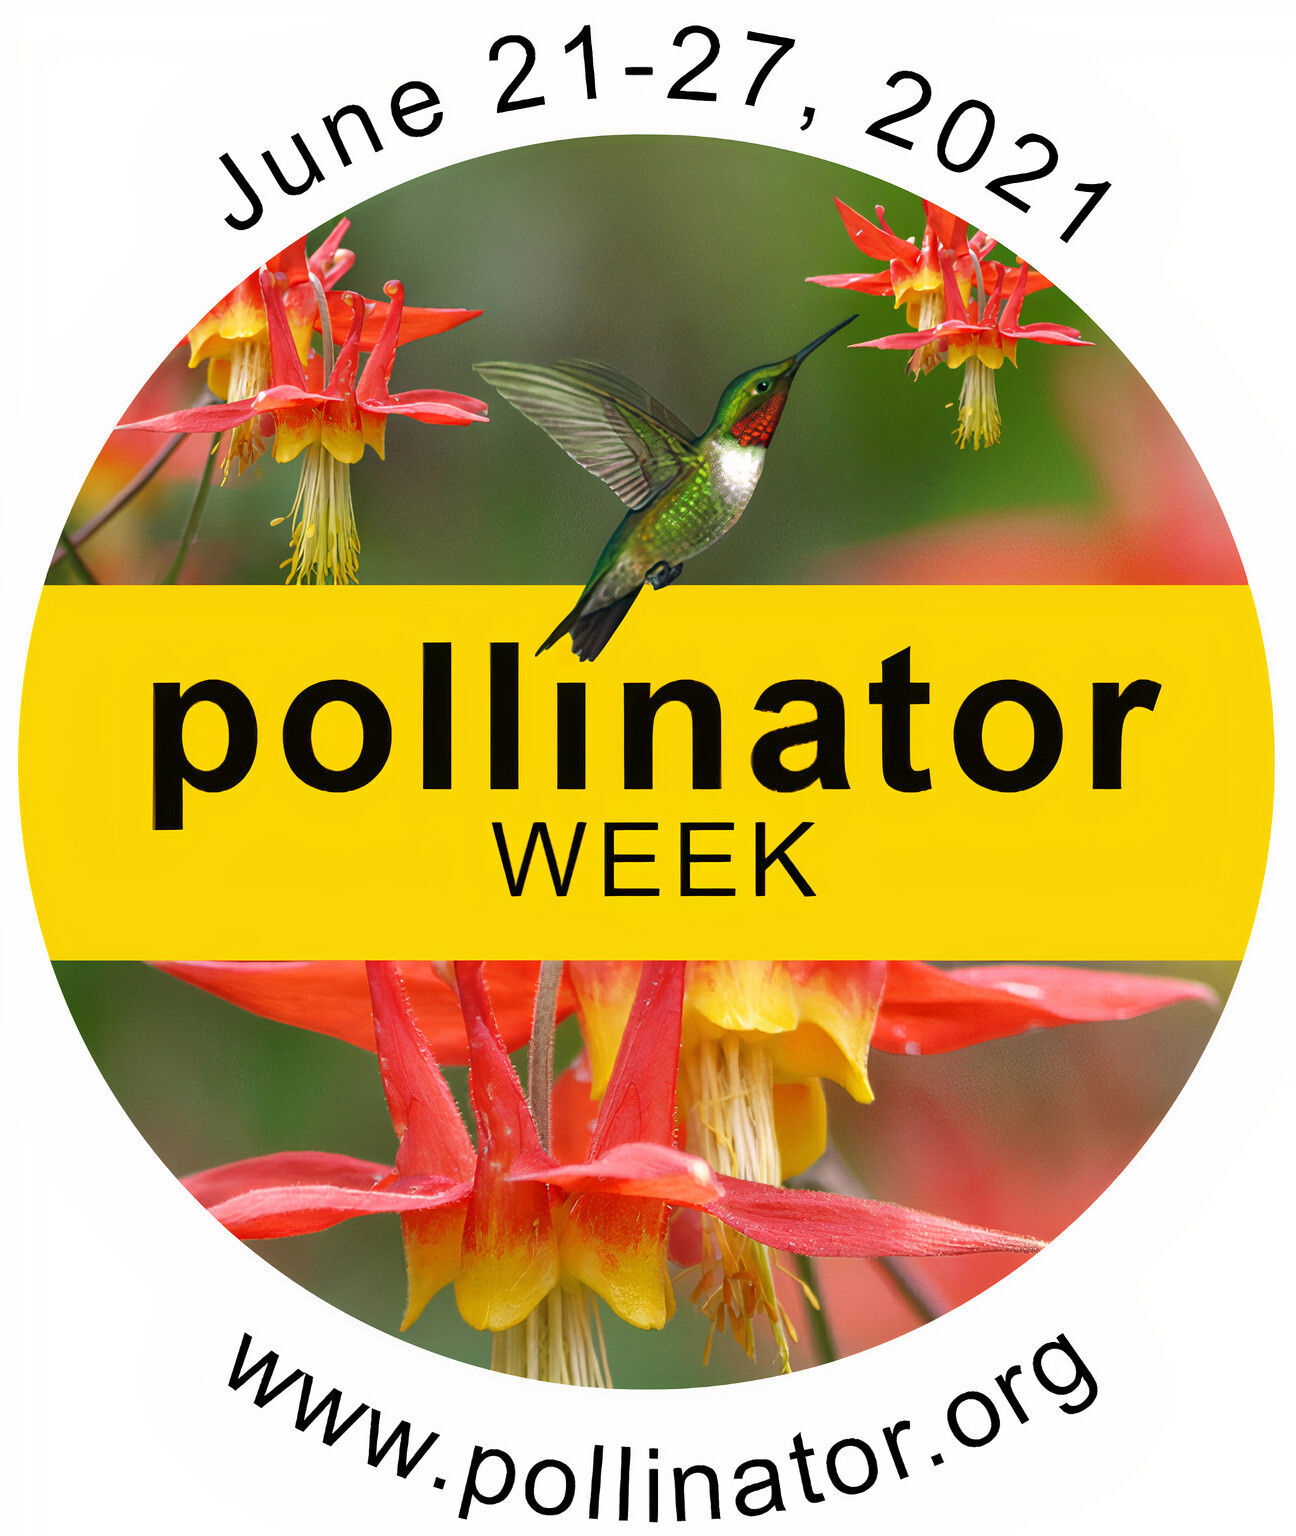 It's National Pollinator Week